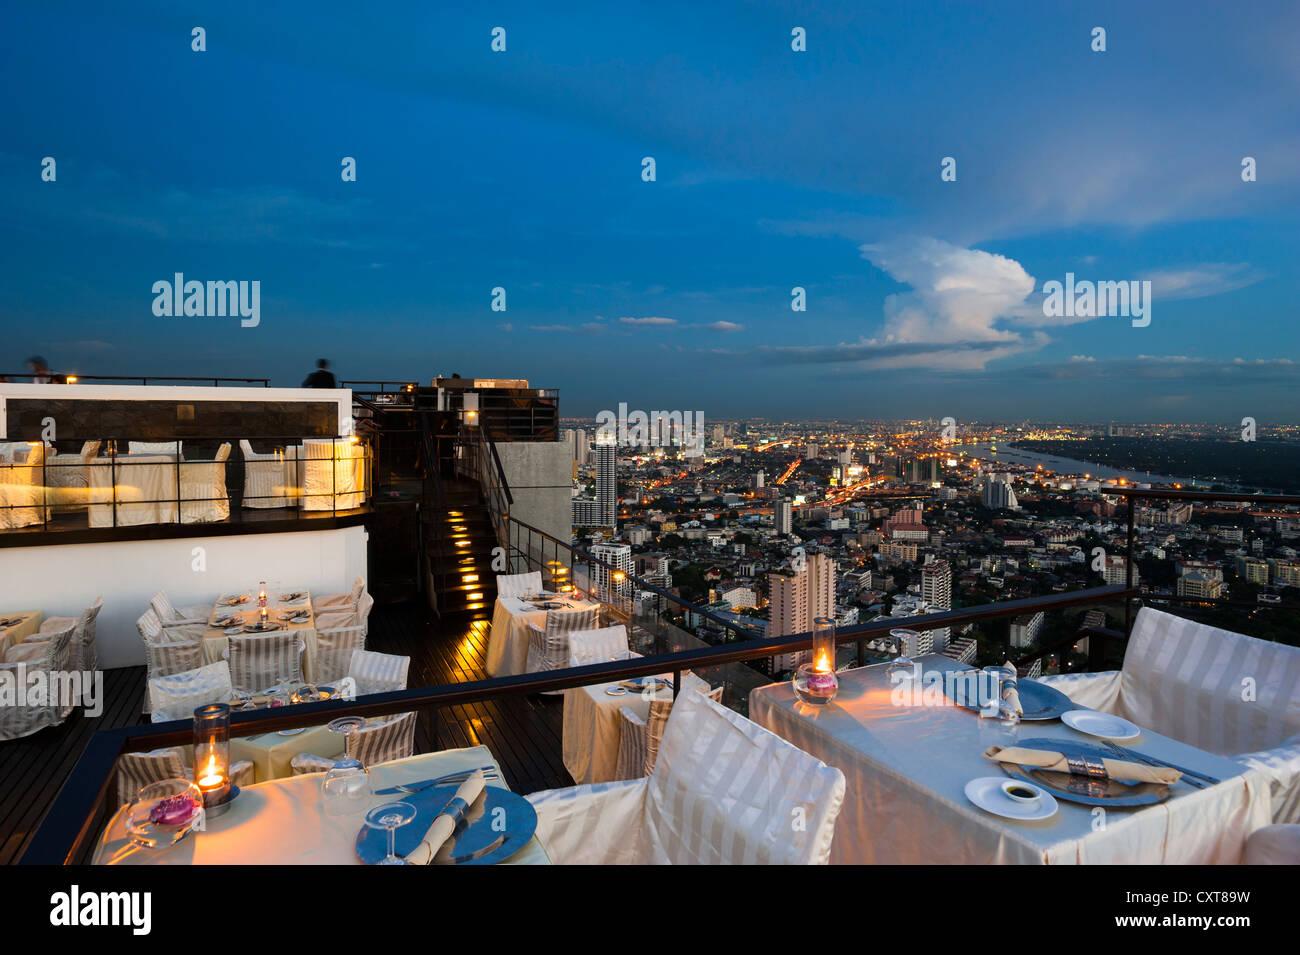 View of the city, Vertigo Bar and Restaurant, roof of the Banyan Tree Hotel, at dusk, Bangkok, Thailand, Asia - Stock Image